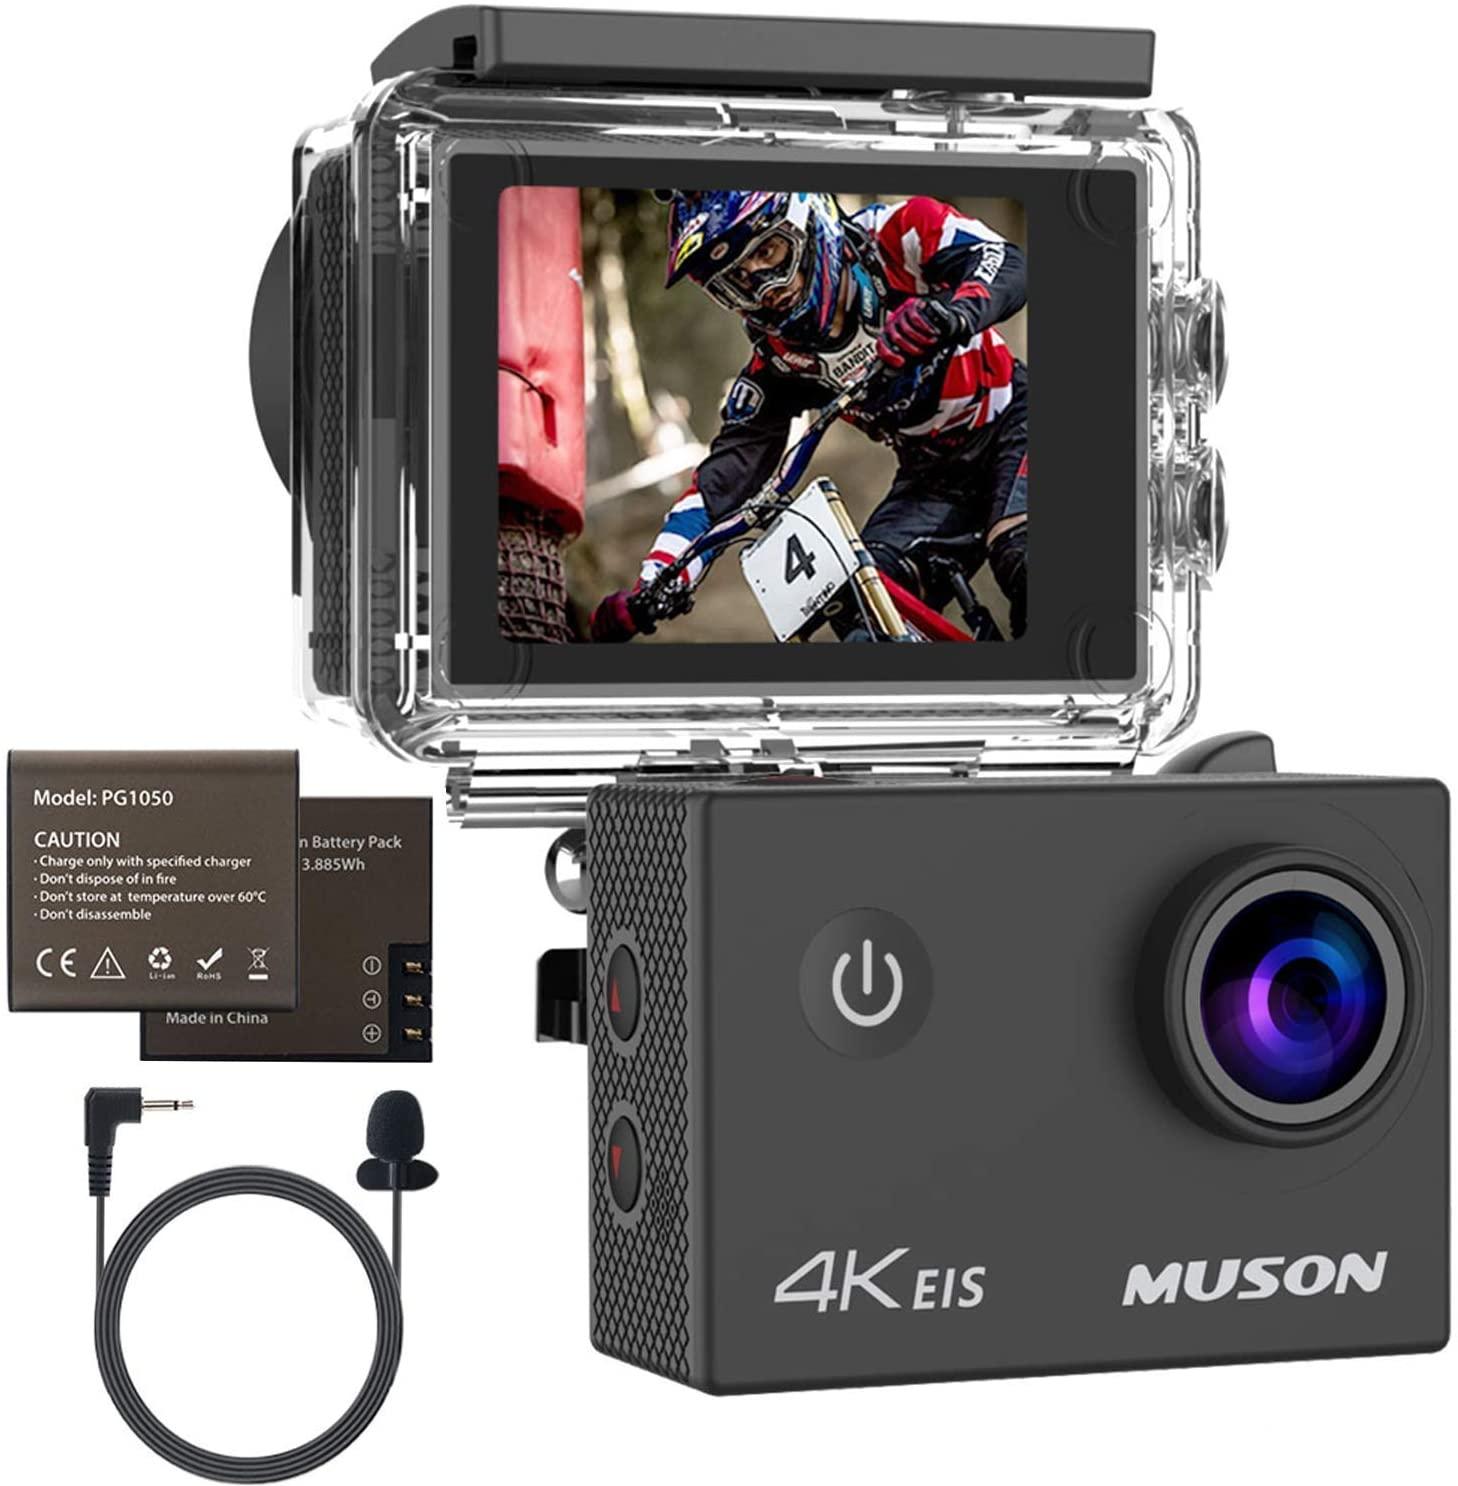 MUSON(ムソン) スポーツアクションカメラ 4K対応の割引クーポンを配信中。